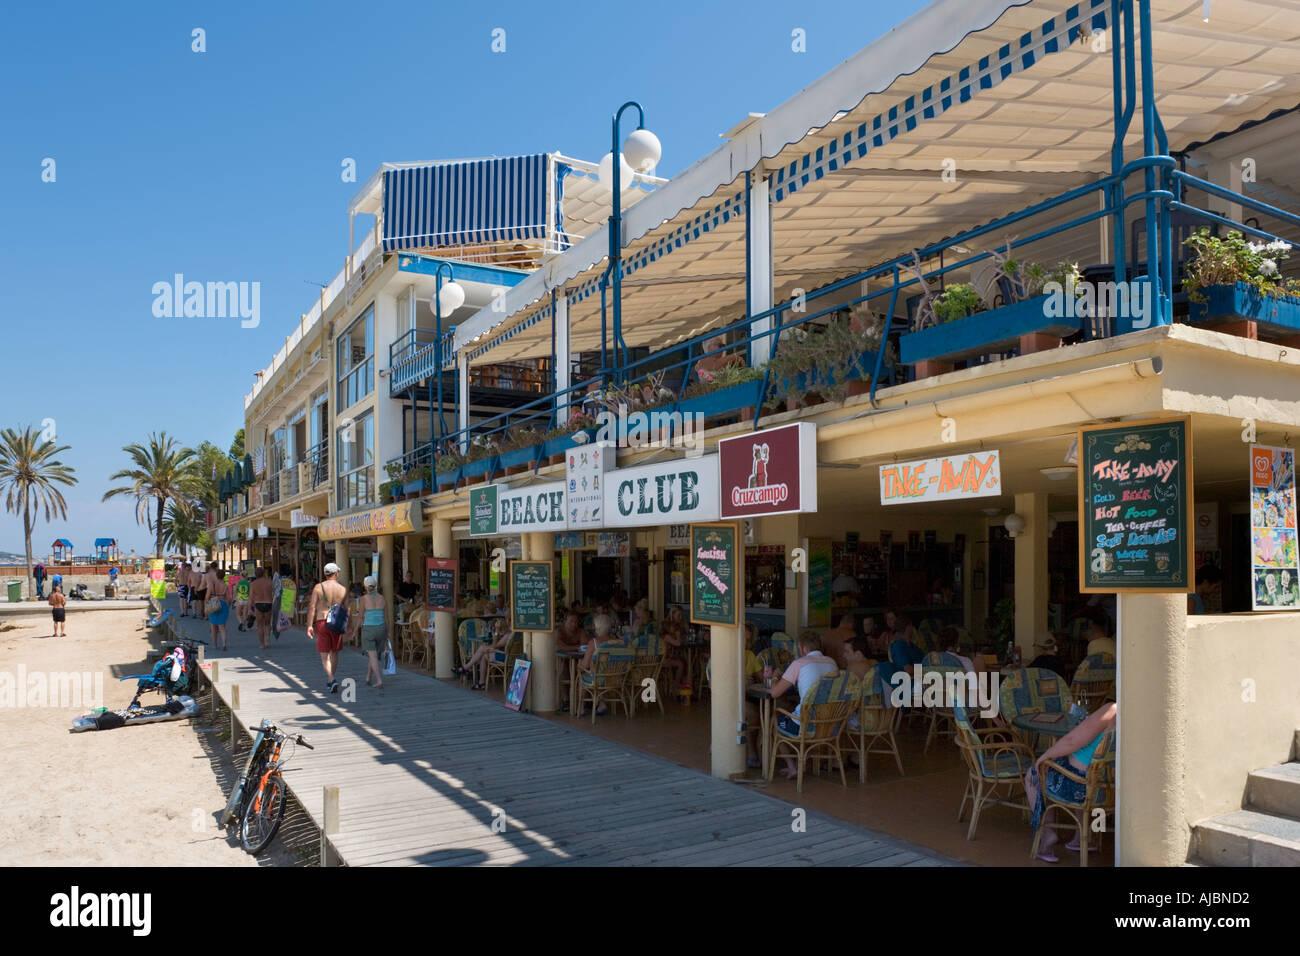 Palma De Mallorca Restaurants Bars Cafes